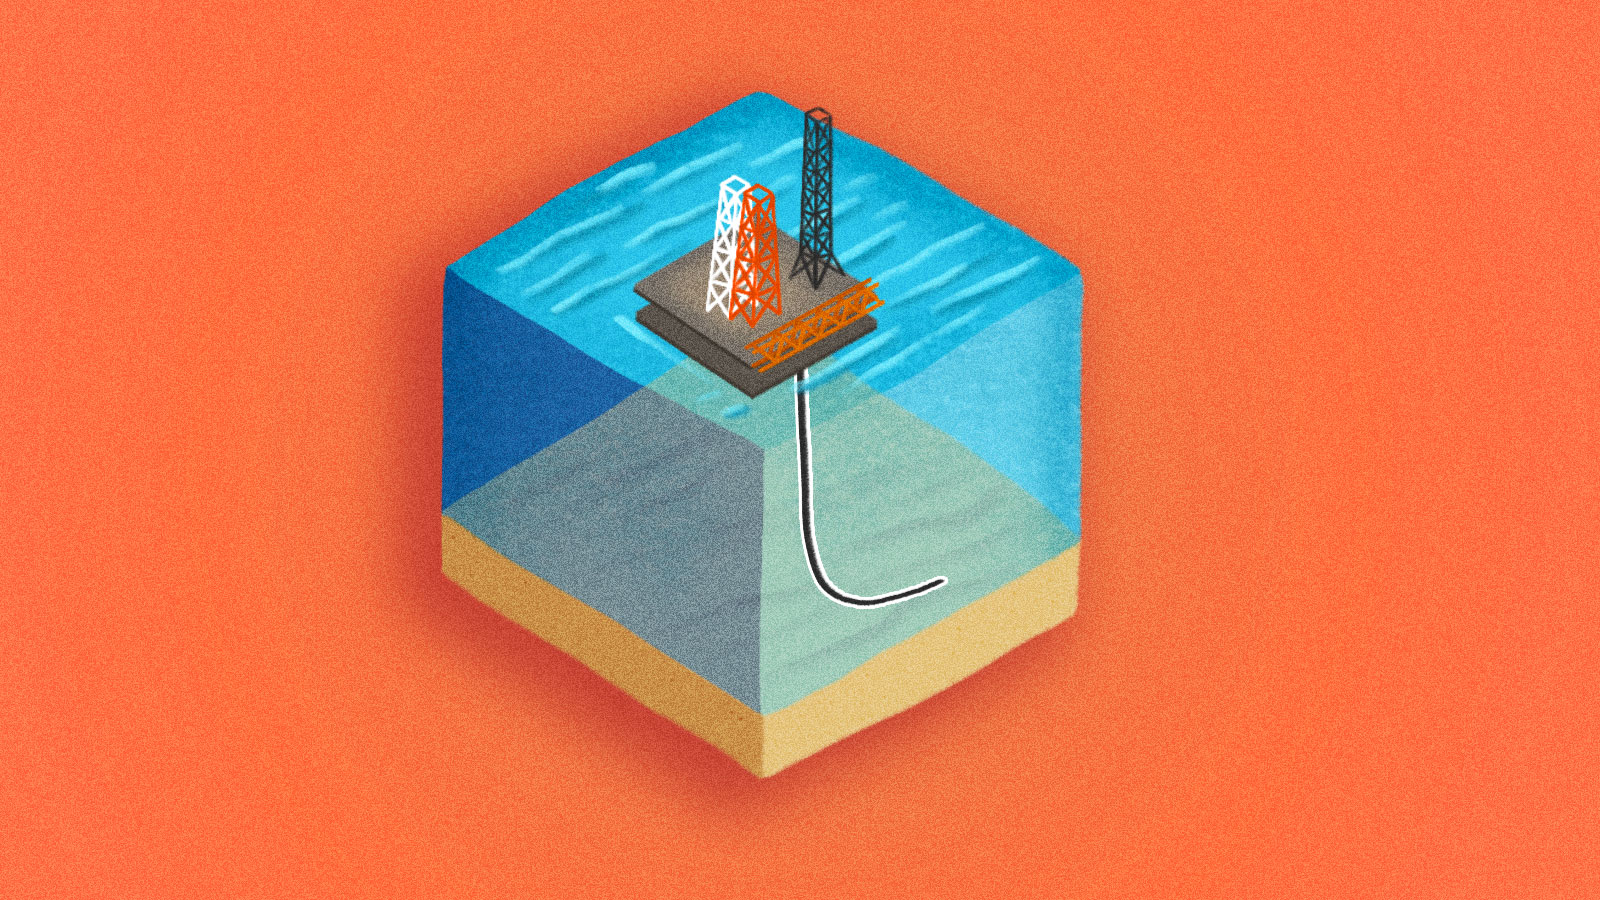 An illustration of a deep sea mining rig